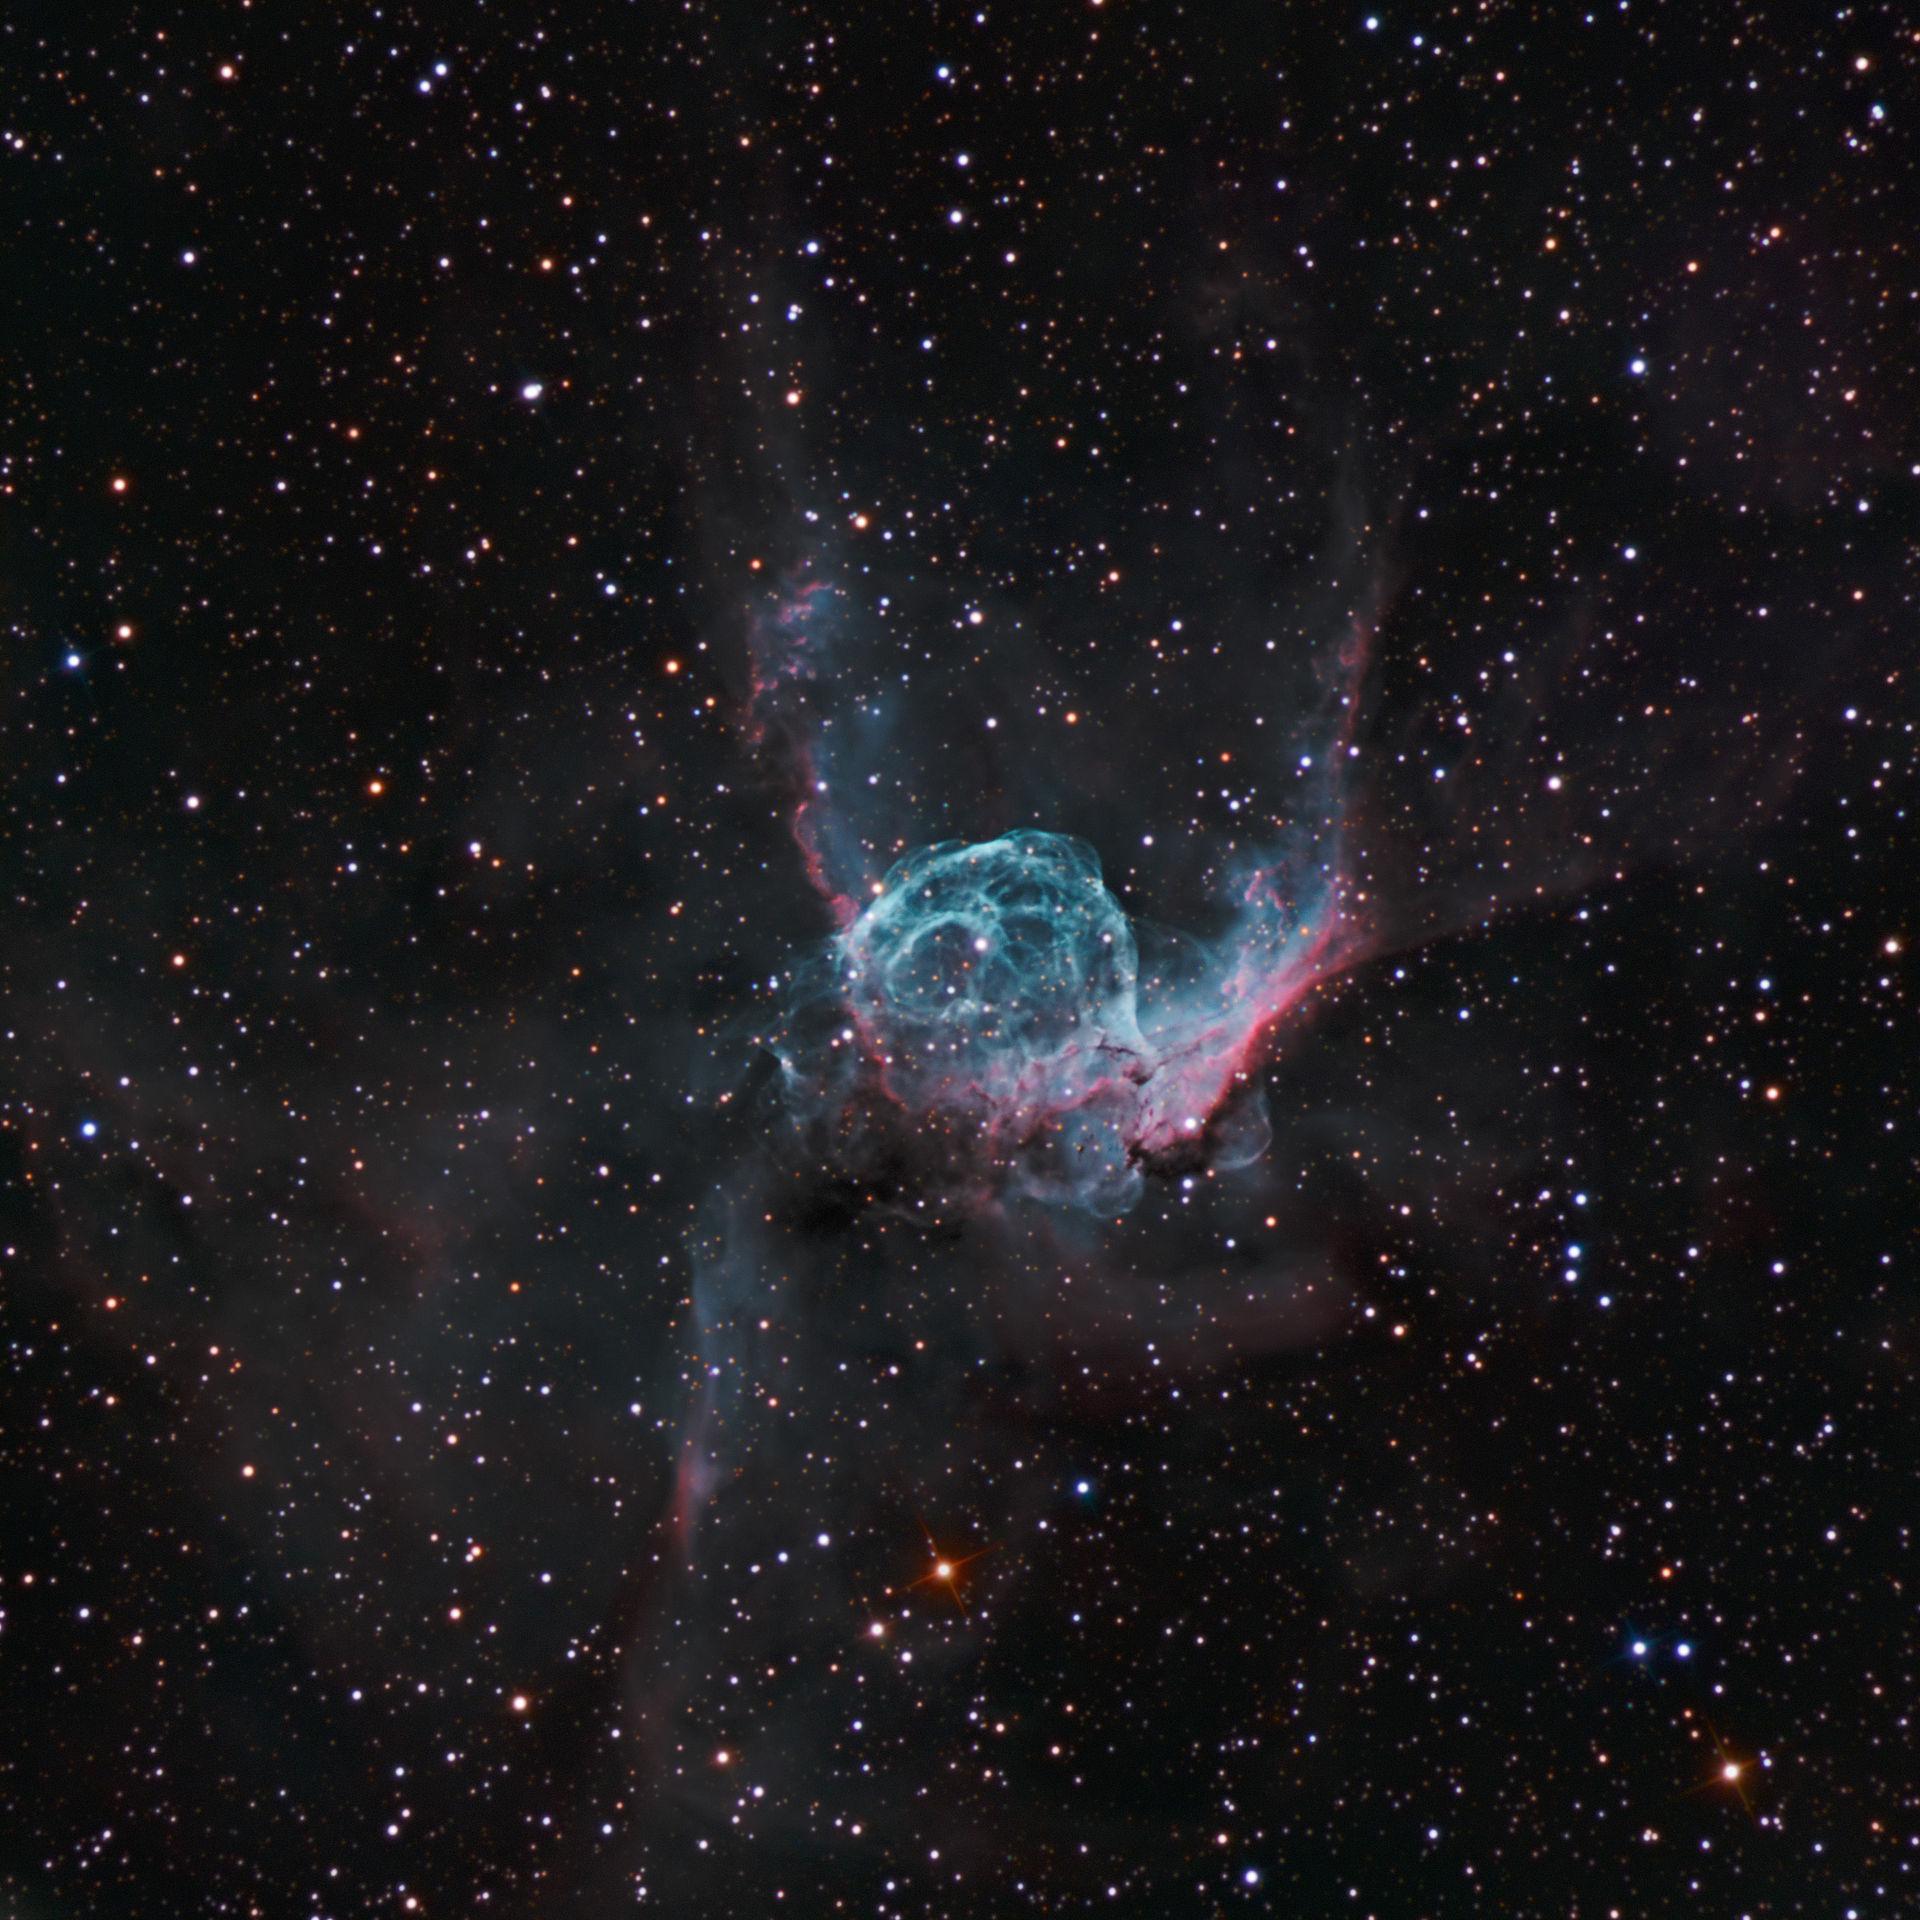 Crescent nebula - narrowband | Crescent nebula NGC 6888